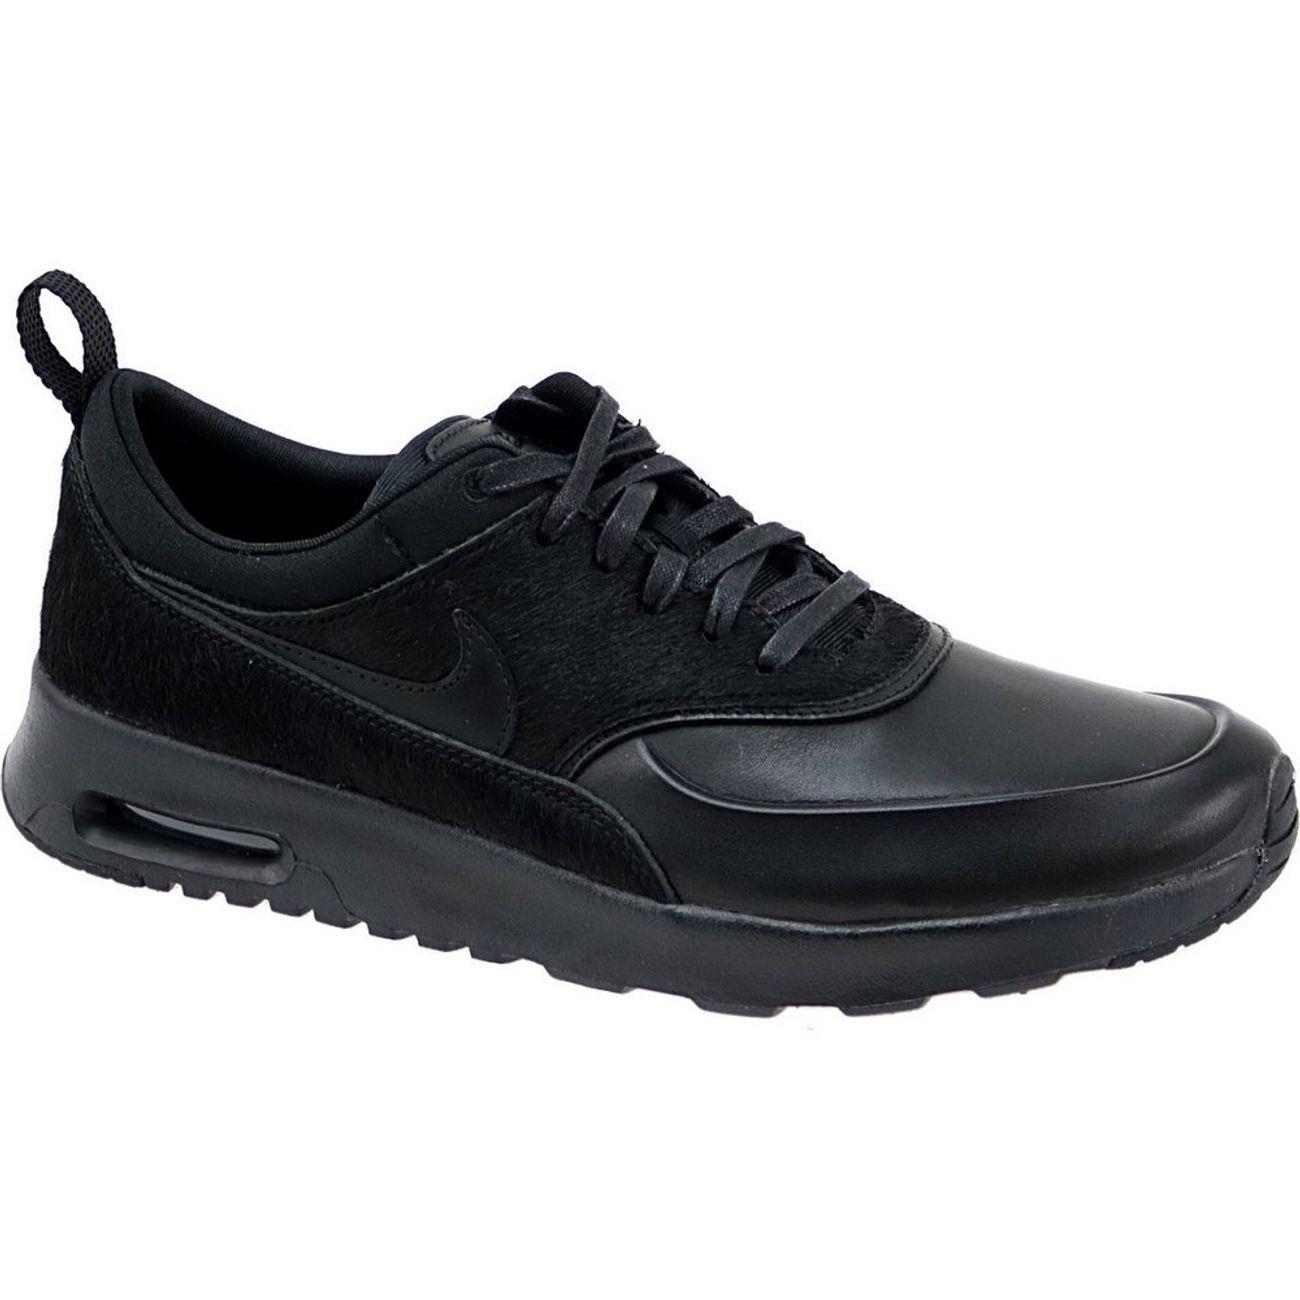 Mode- Lifestyle femme NIKE Nike Wmns Air Max Thea Premium